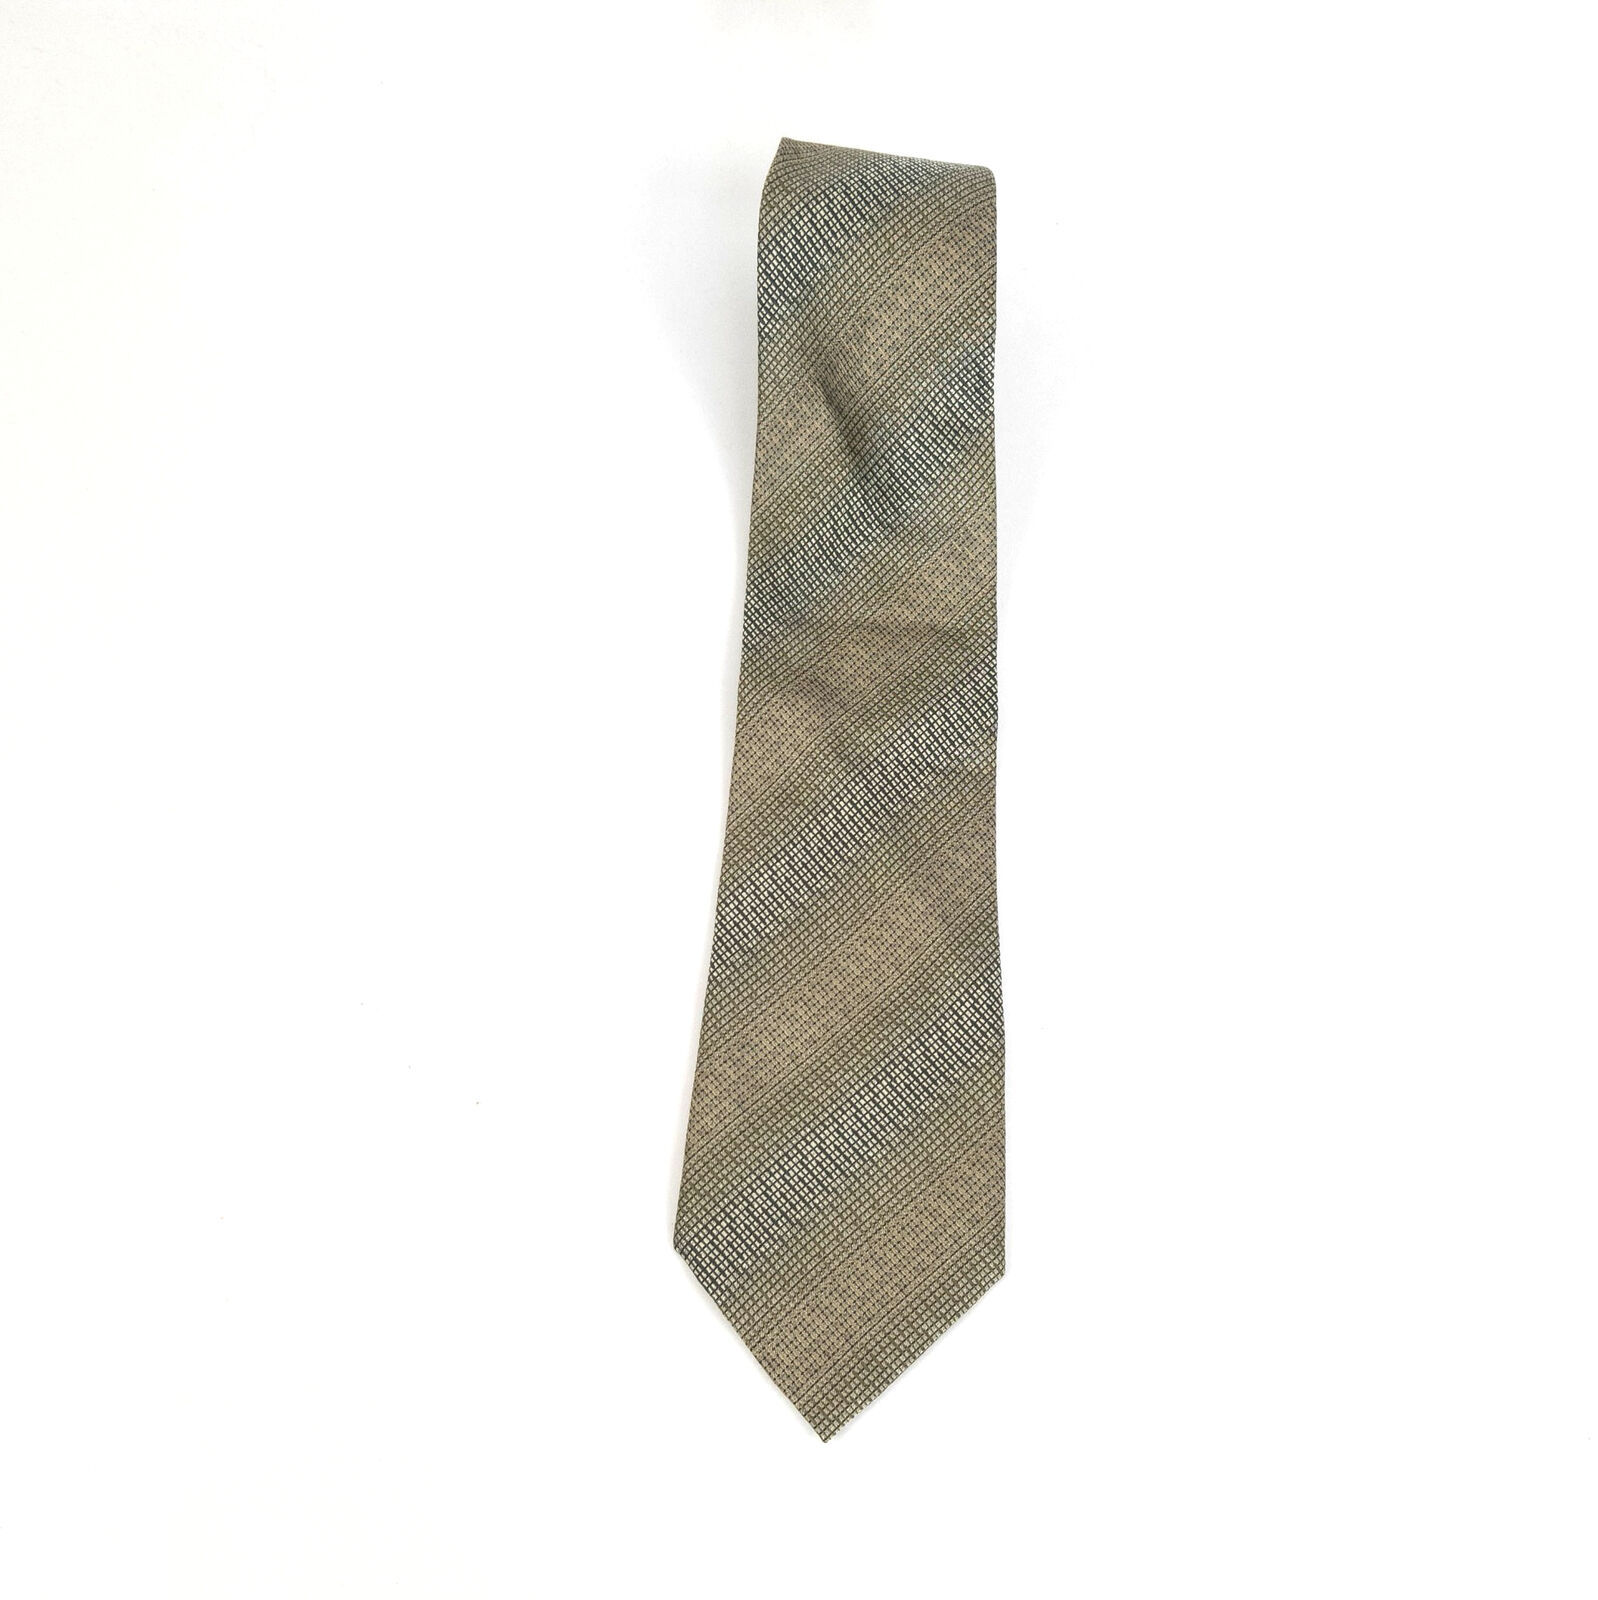 Kenneth Cole New York Green Geometric Silk Necktie Tie image 2